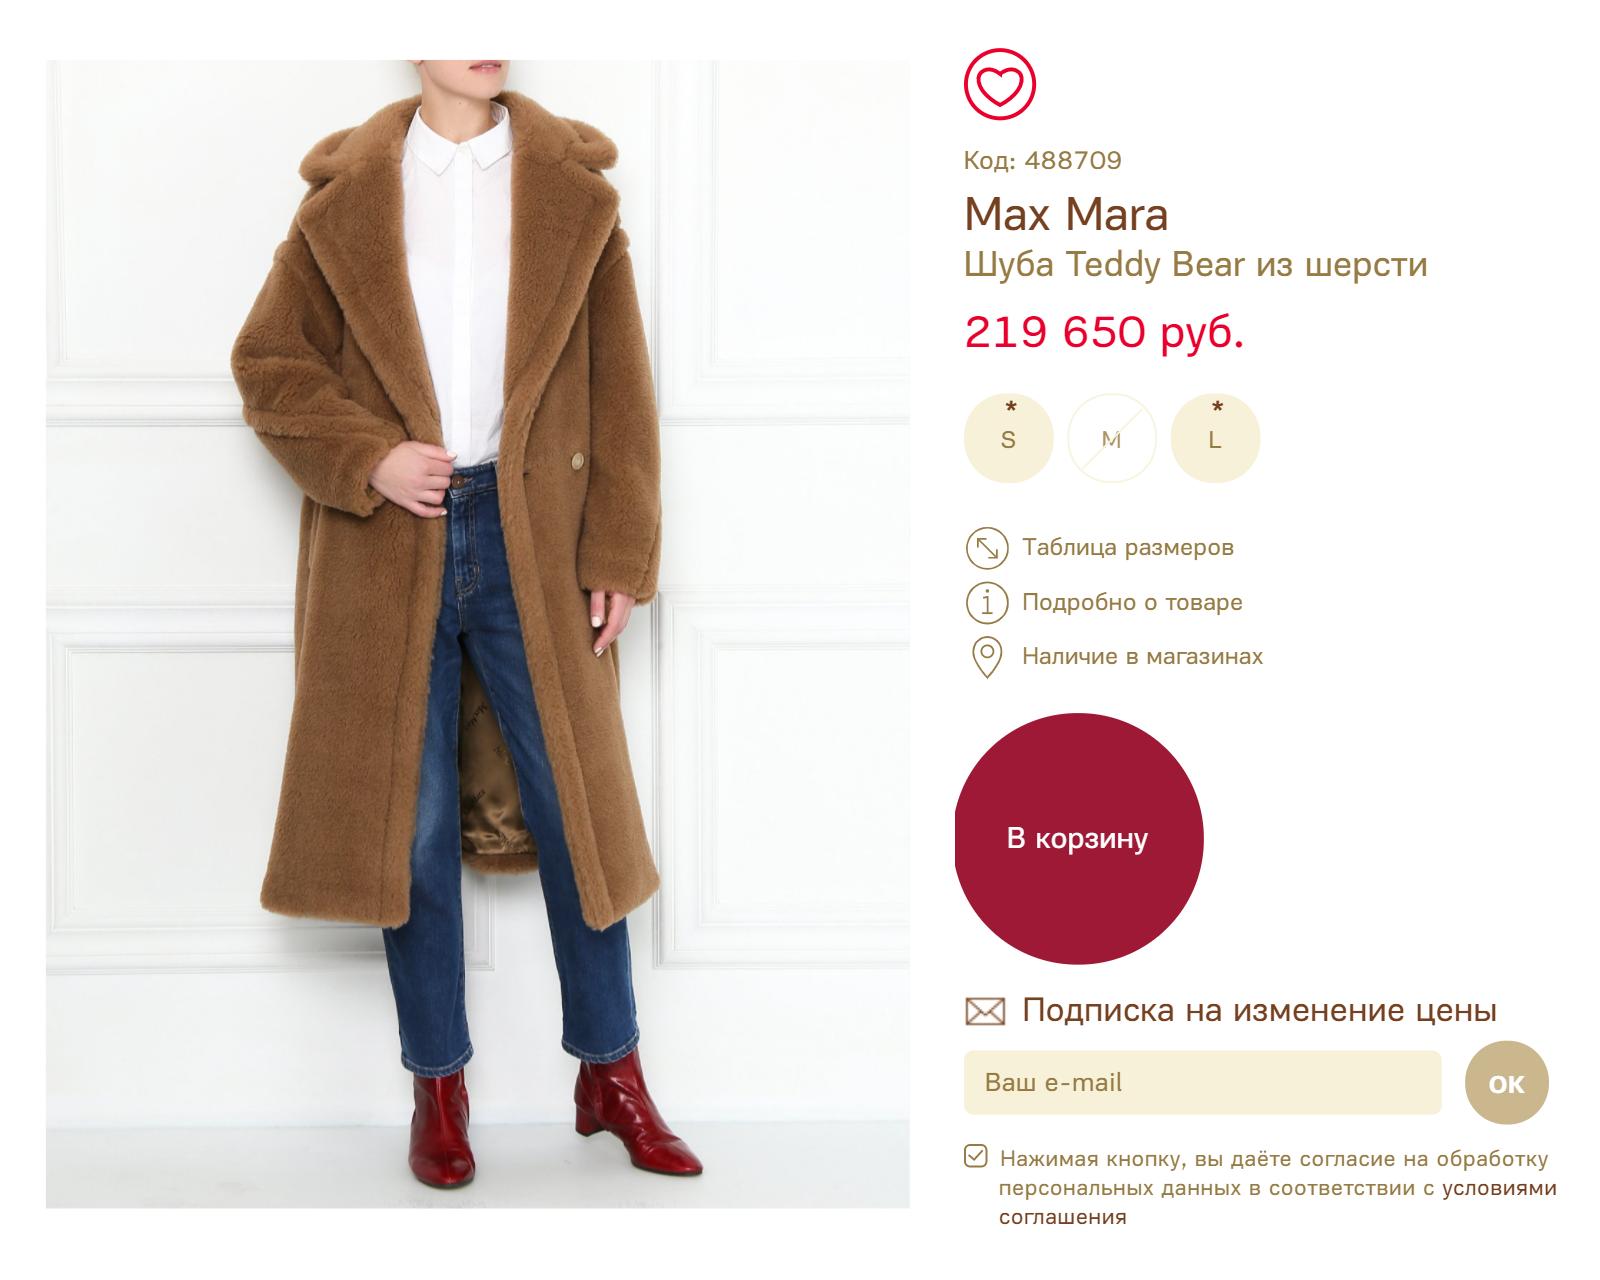 Шуба Max Mara Teddy Bear в России в магазине Bosco стоит 219 650<span class=ruble>Р</span>. Источник: bosco.ru